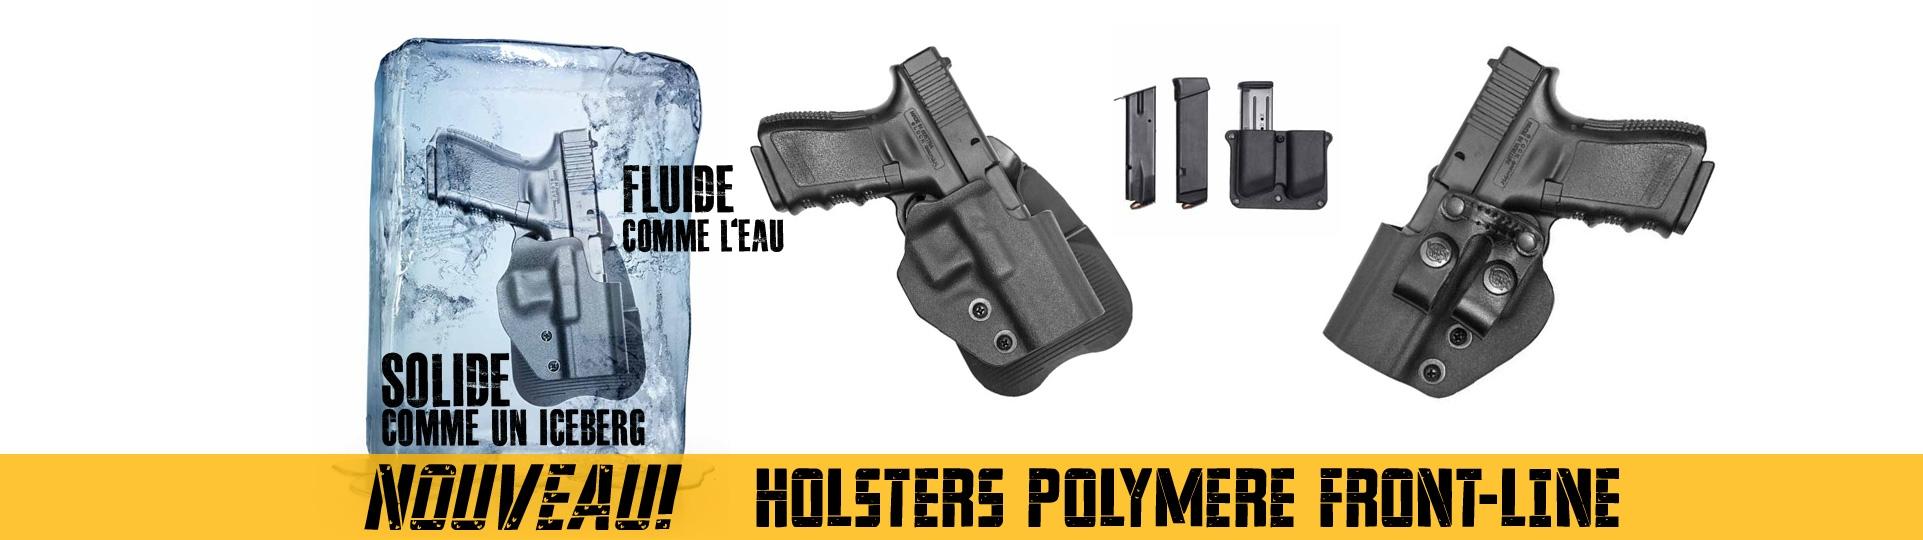 Nouveau Holsters Polymere Front Line